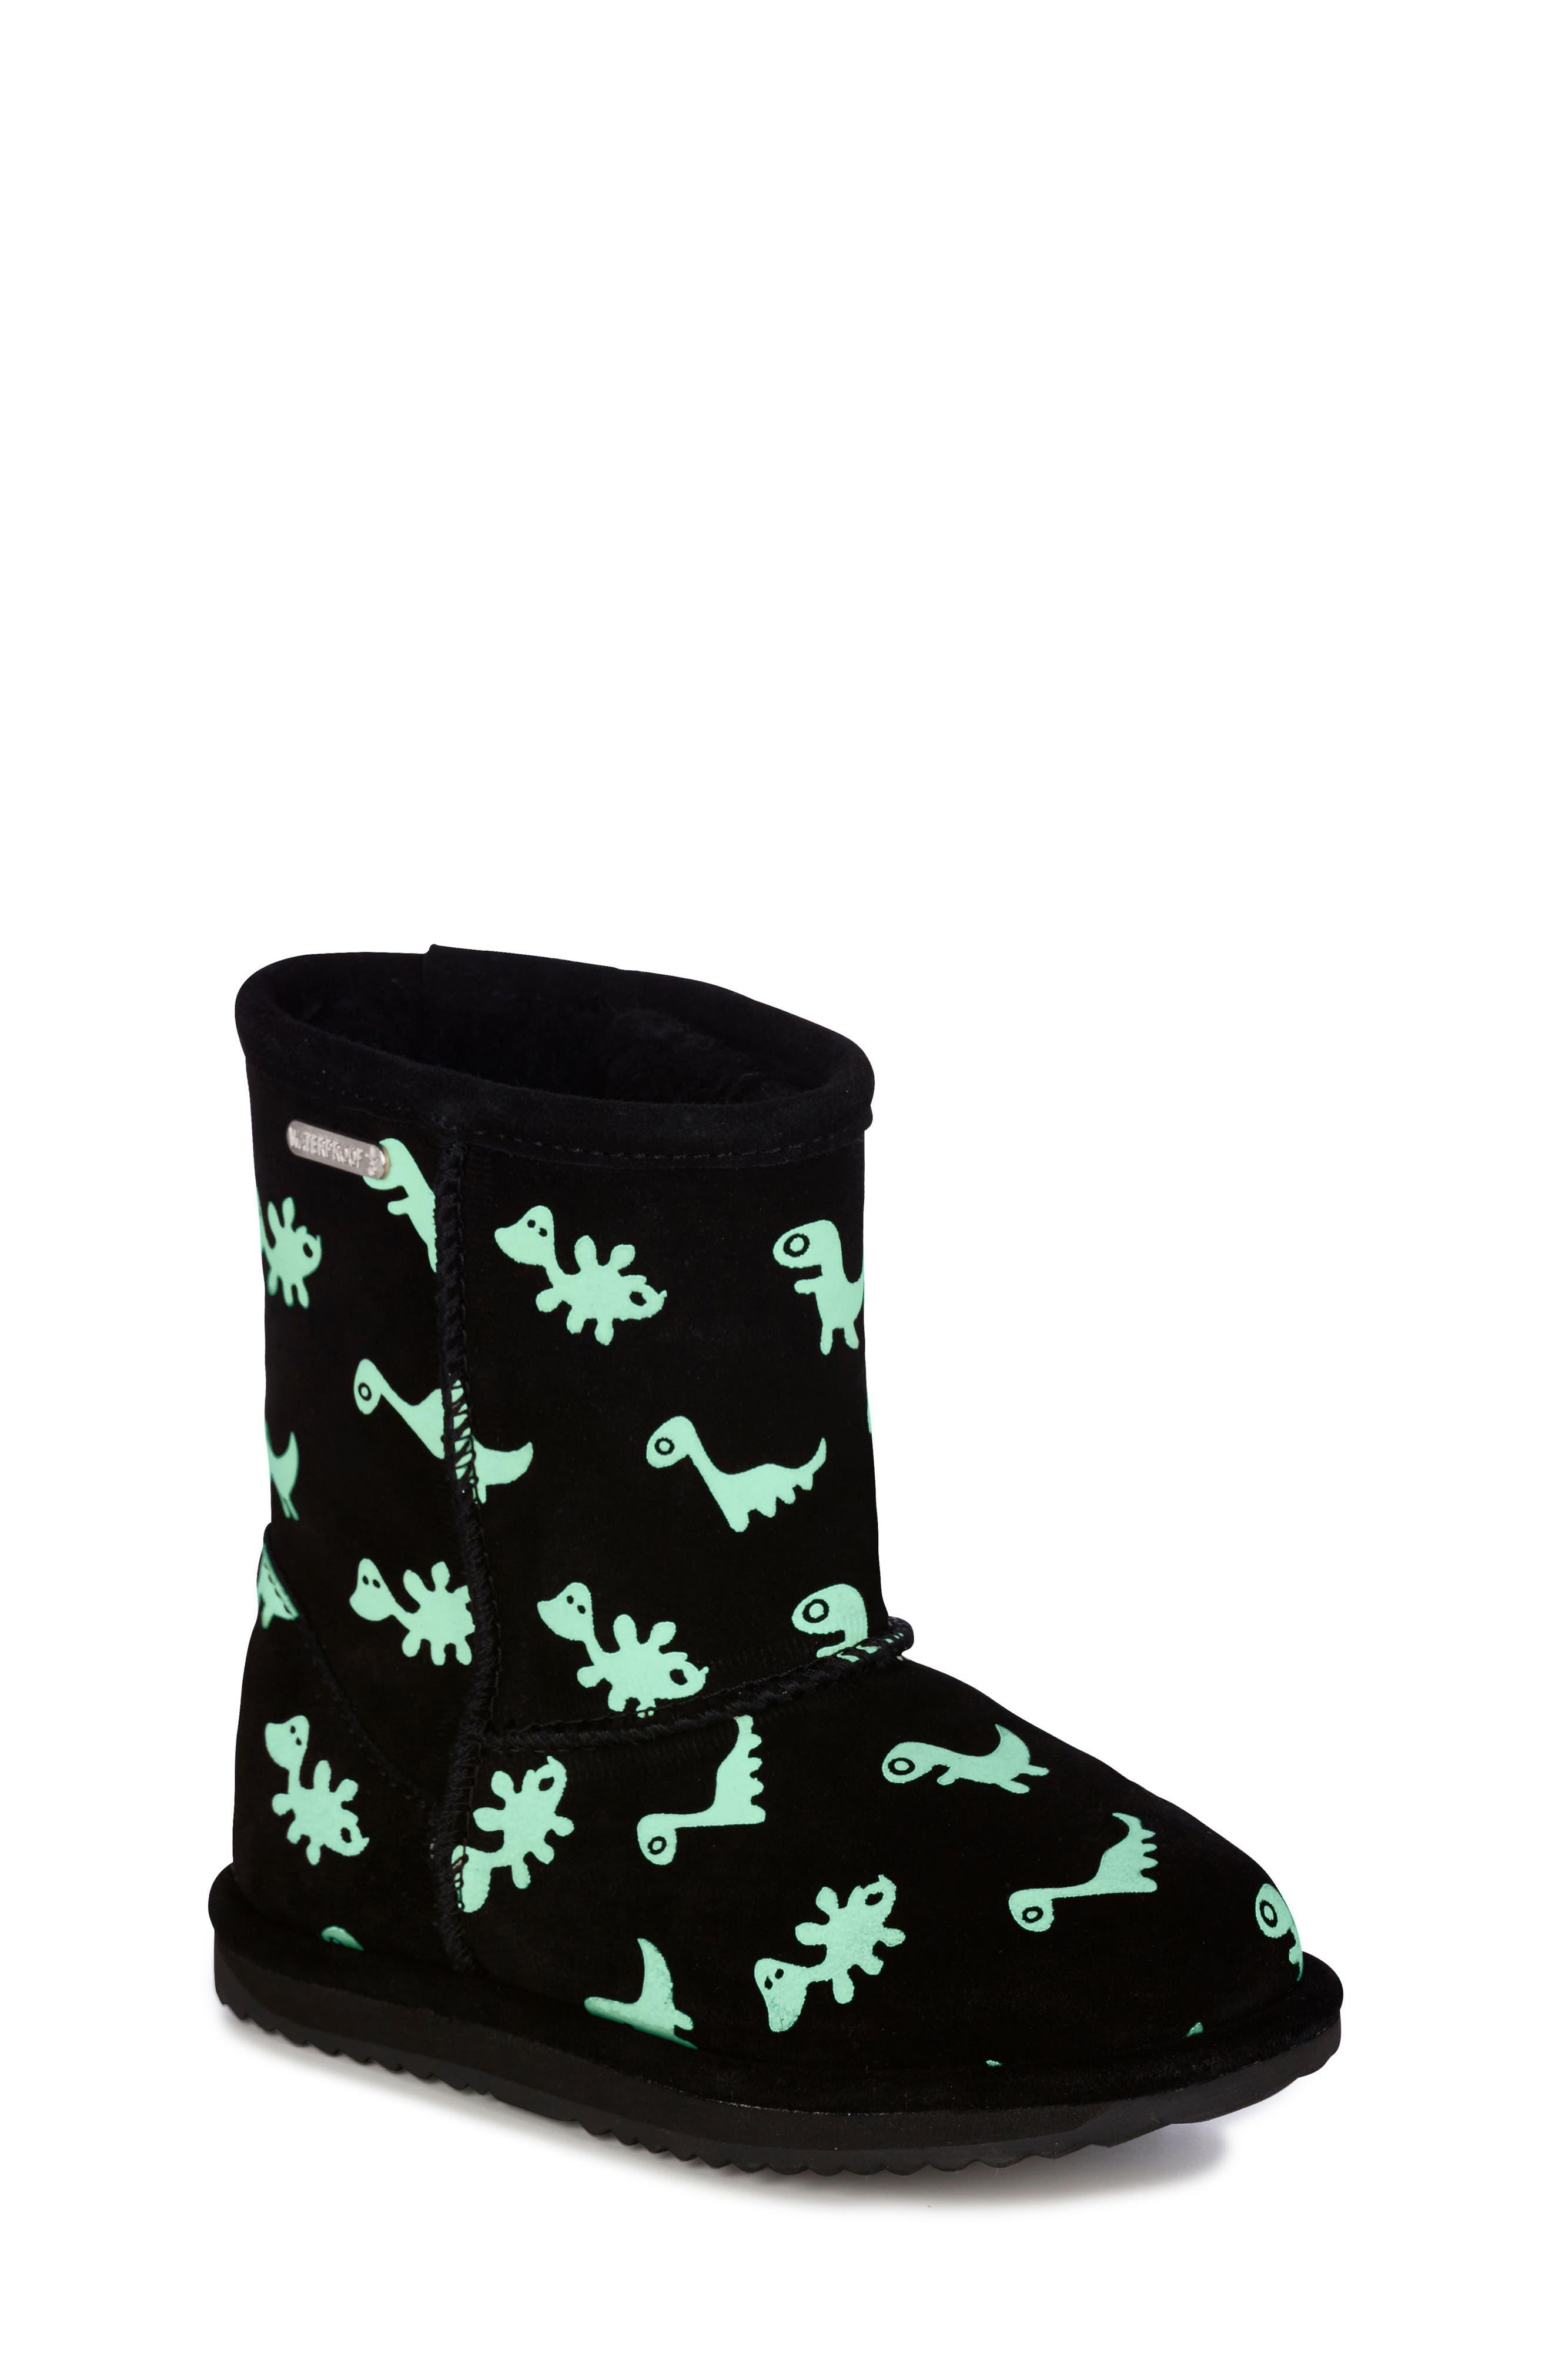 Animal Print Boots,                             Alternate thumbnail 6, color,                             BLACK